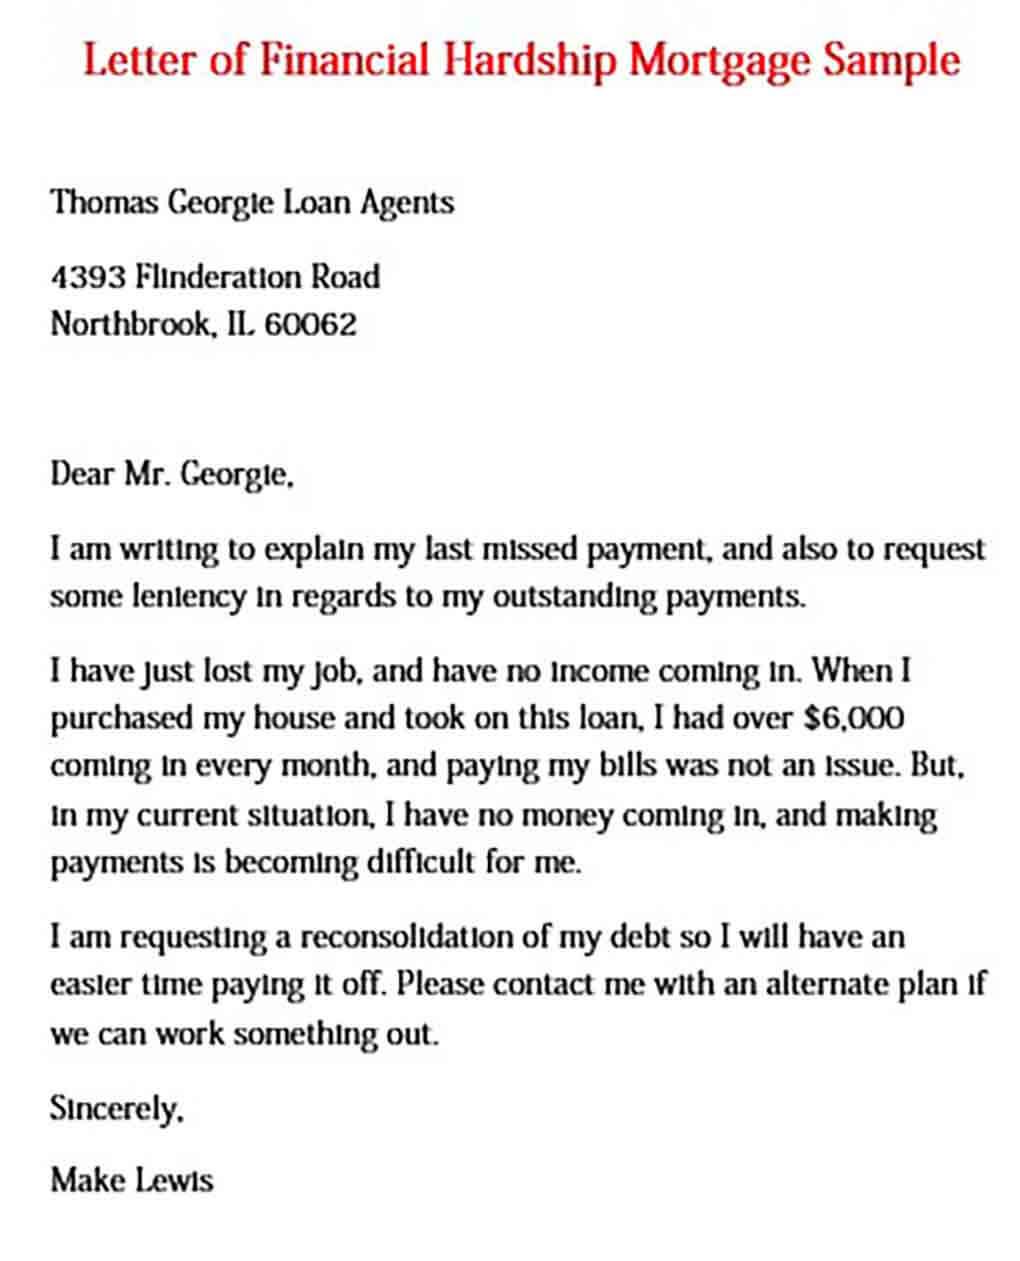 Letter of Financial Hardship Mortgage